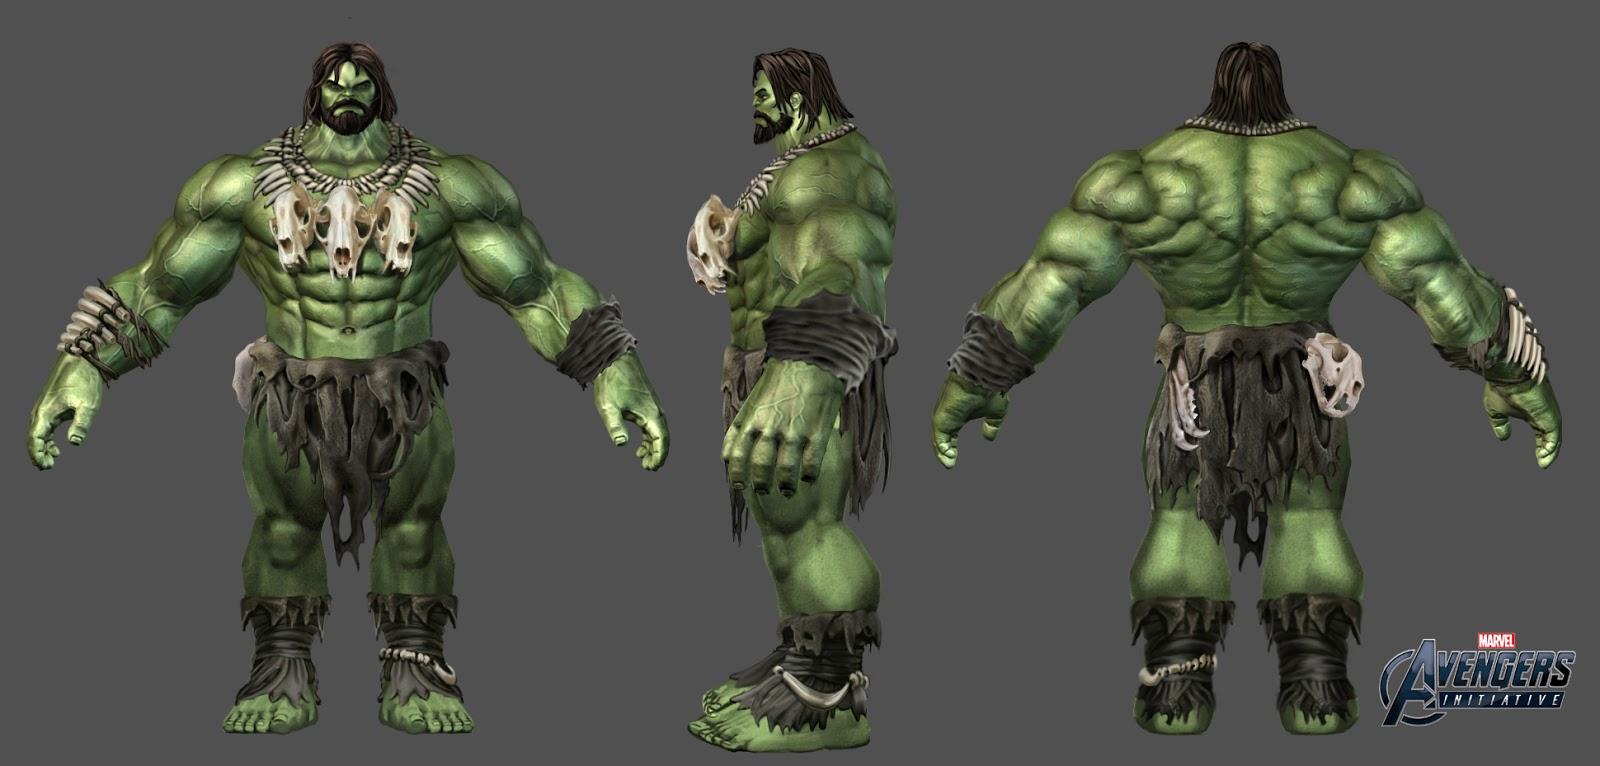 3d Hologram Wallpaper Gif Radia 231 227 O Gama Imagens Do Hulk Para Avengers Initiative